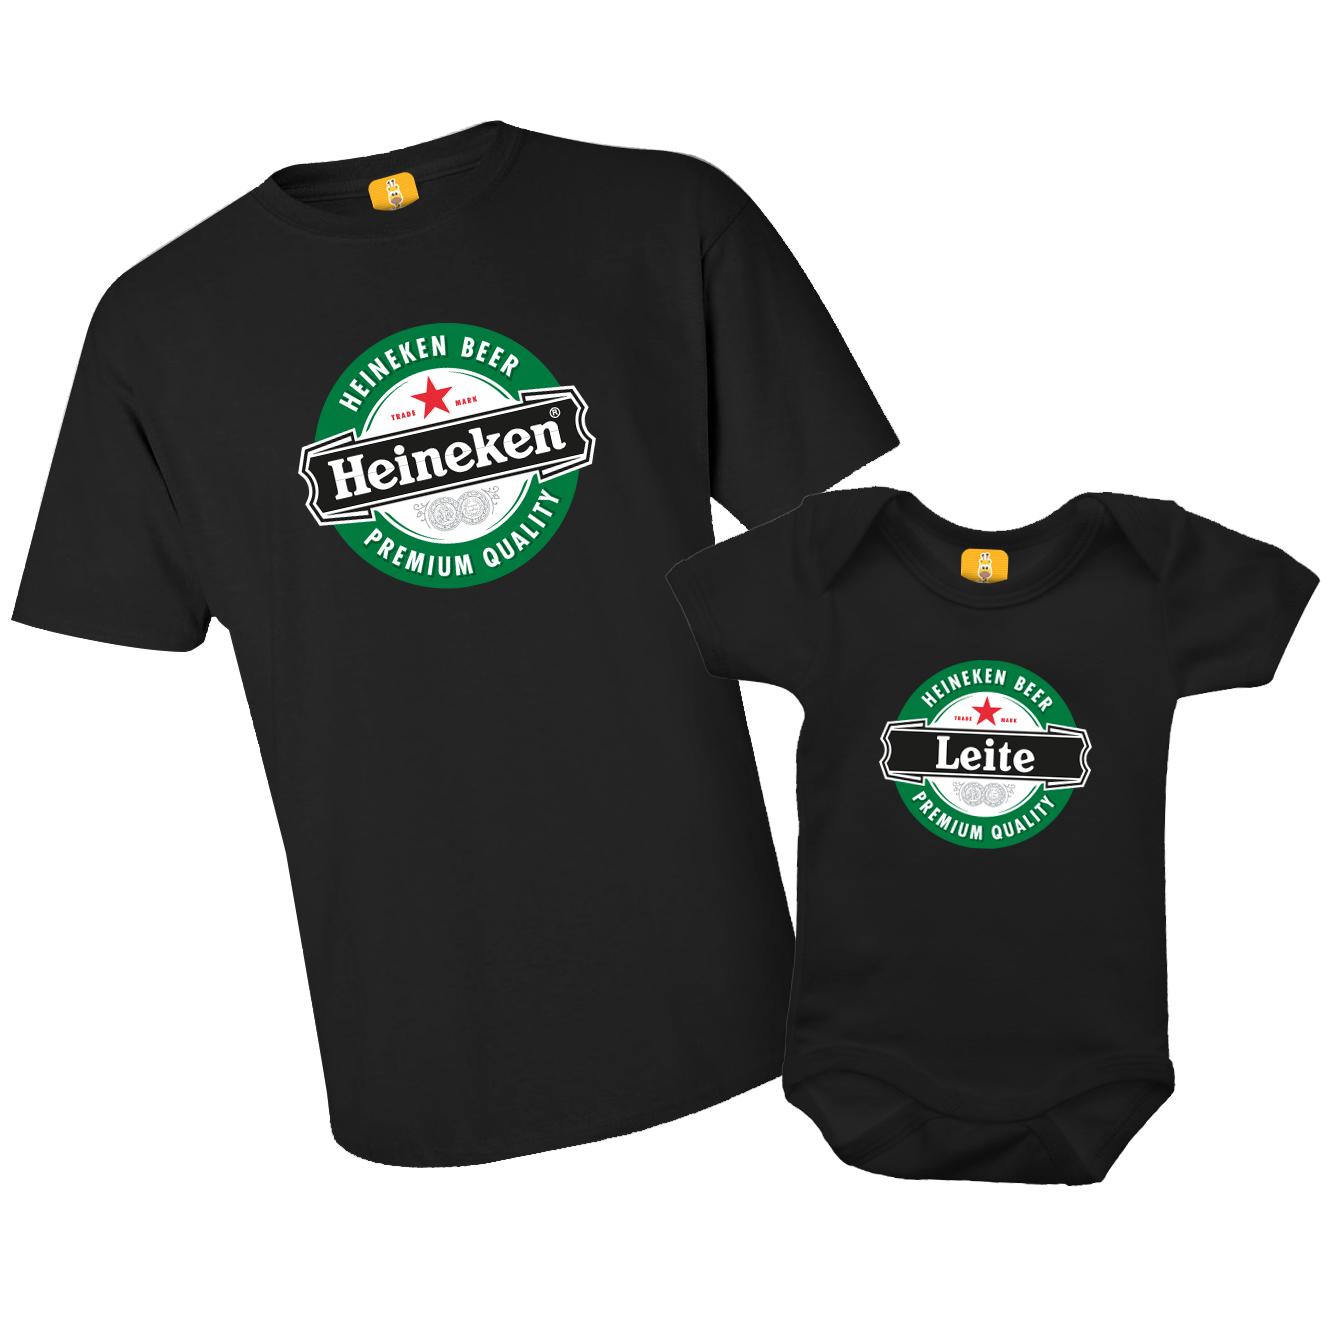 Kit Camiseta e Body - Tal Pai Tal Filho (a) - Heineken